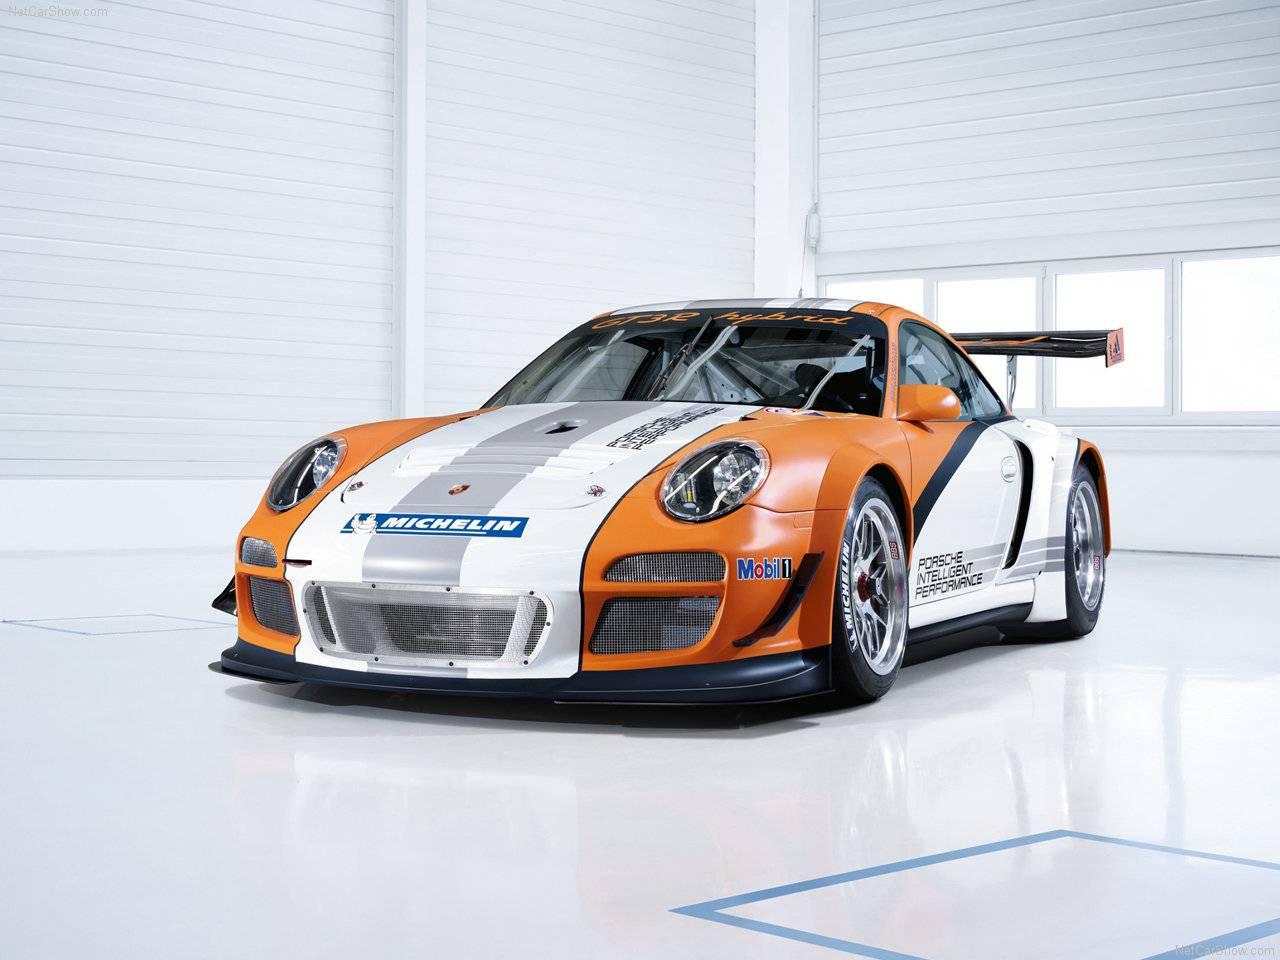 http://3.bp.blogspot.com/_lsyt_wQ2awY/TDrBtnI8Y6I/AAAAAAAB9wA/yKdZ2ylVP3c/s1600/Porsche-911_GT3_R_Hybrid_2011_1280x960_wallpaper_02.jpg